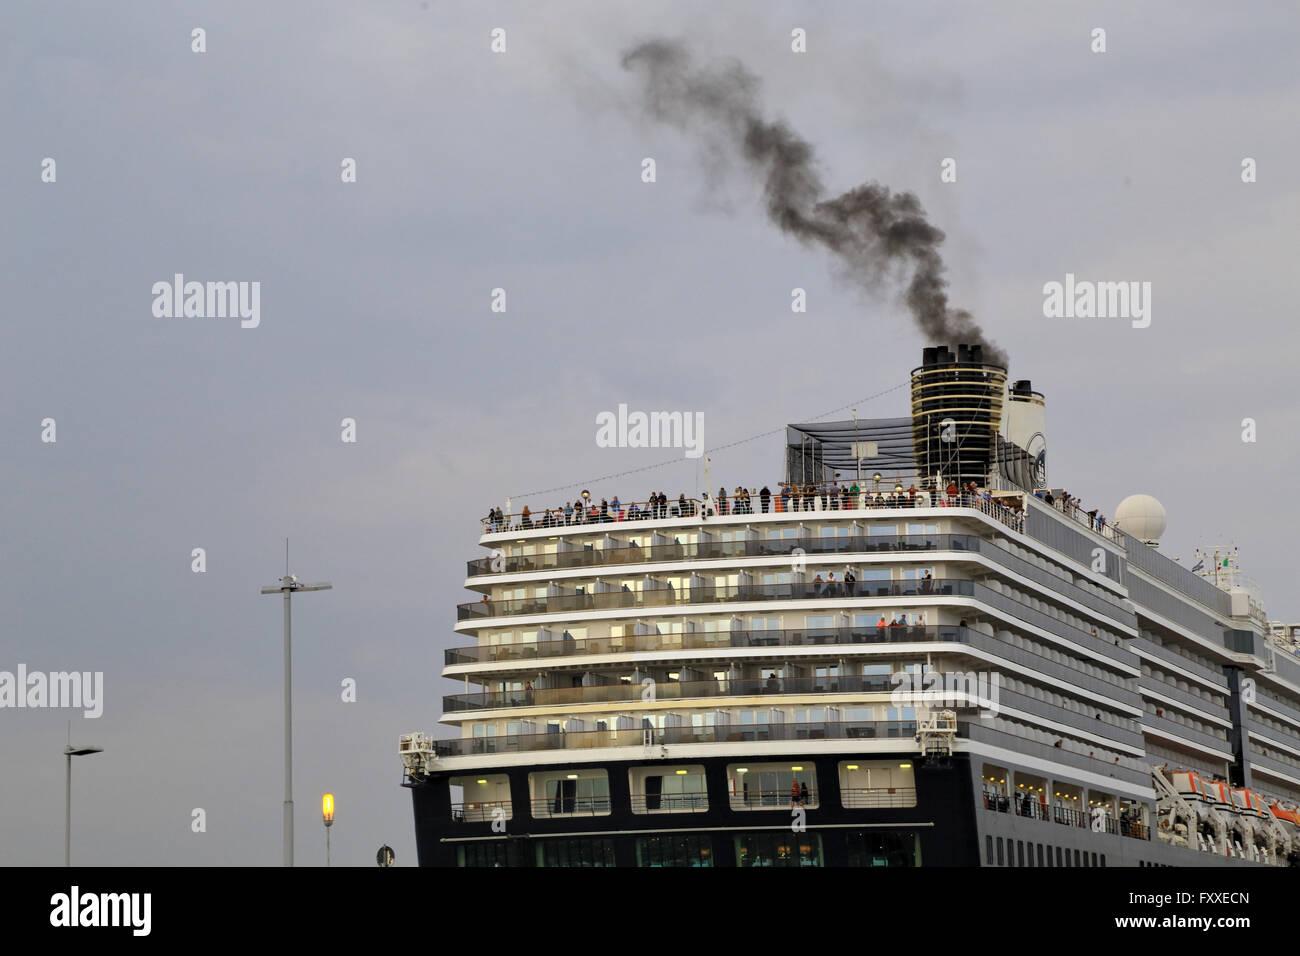 Ship smoke. Increasing cruise ship pollutions in Venice prompted into a 'no grandi navi' protest. - Stock Image